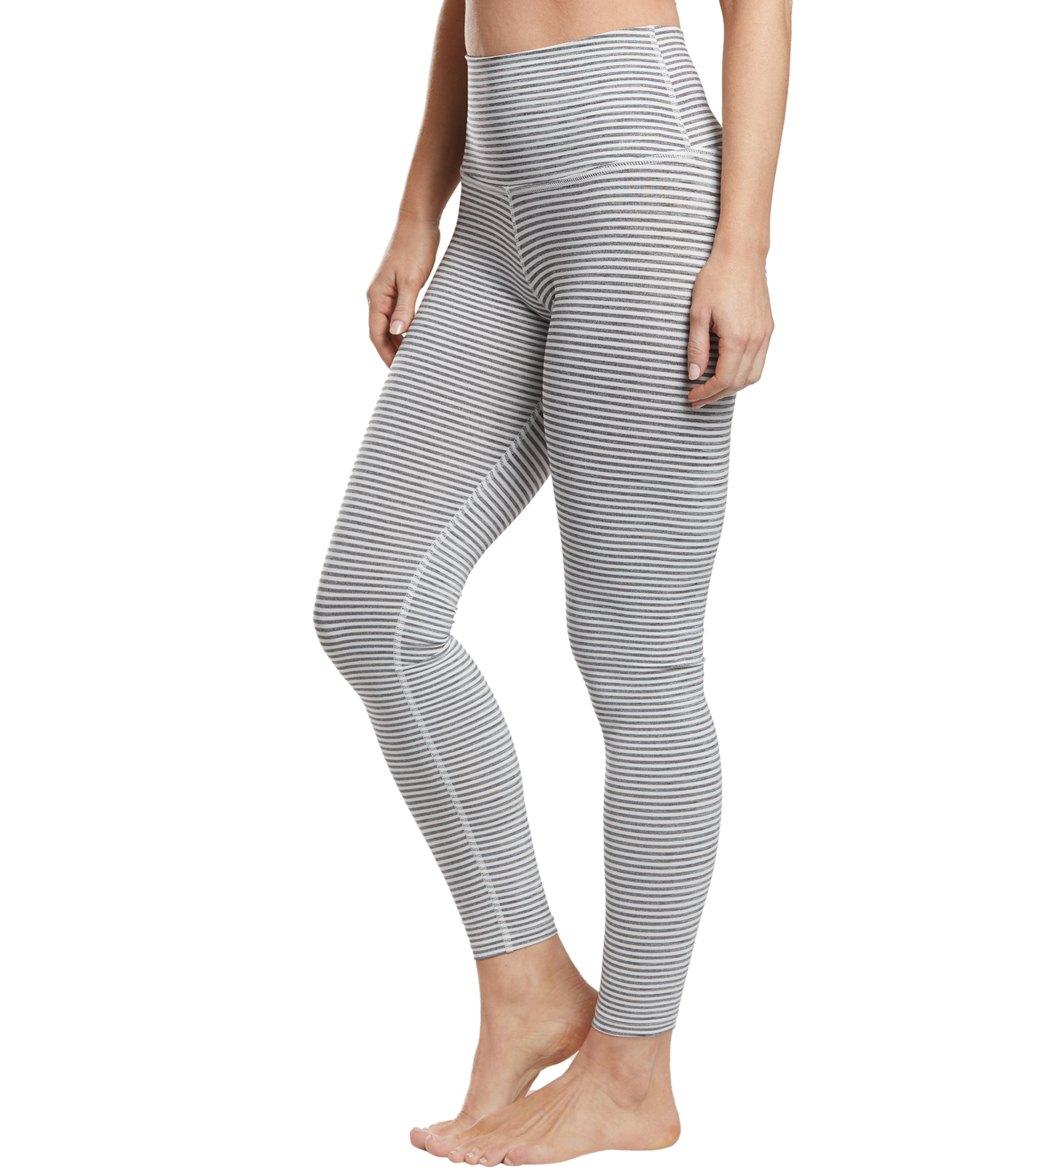 21b076c63a111d Yoga Pants · Leggings · Long Leggings. Visit Product Page close X. Loading  photo.